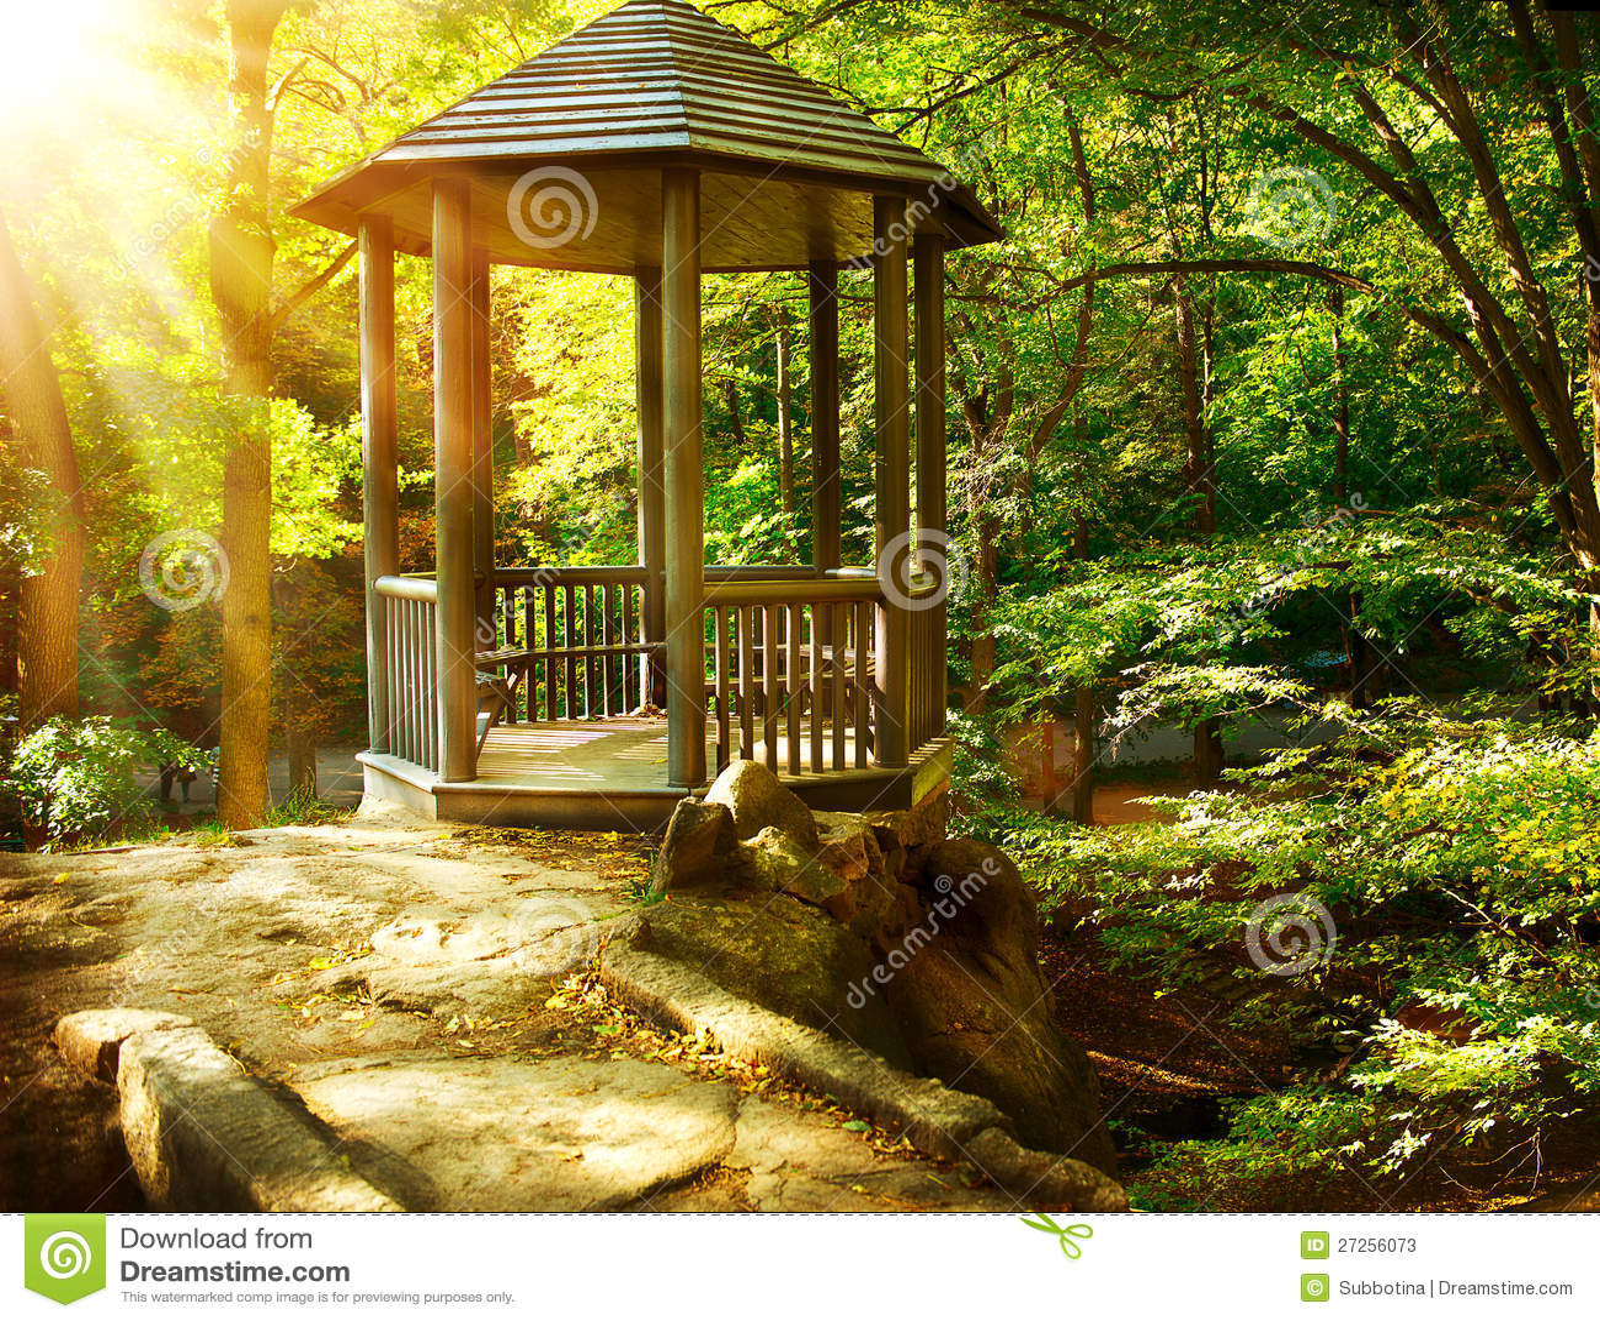 Arbor Park: Arbor In Autumnal Park Stock Image. Image Of Nature